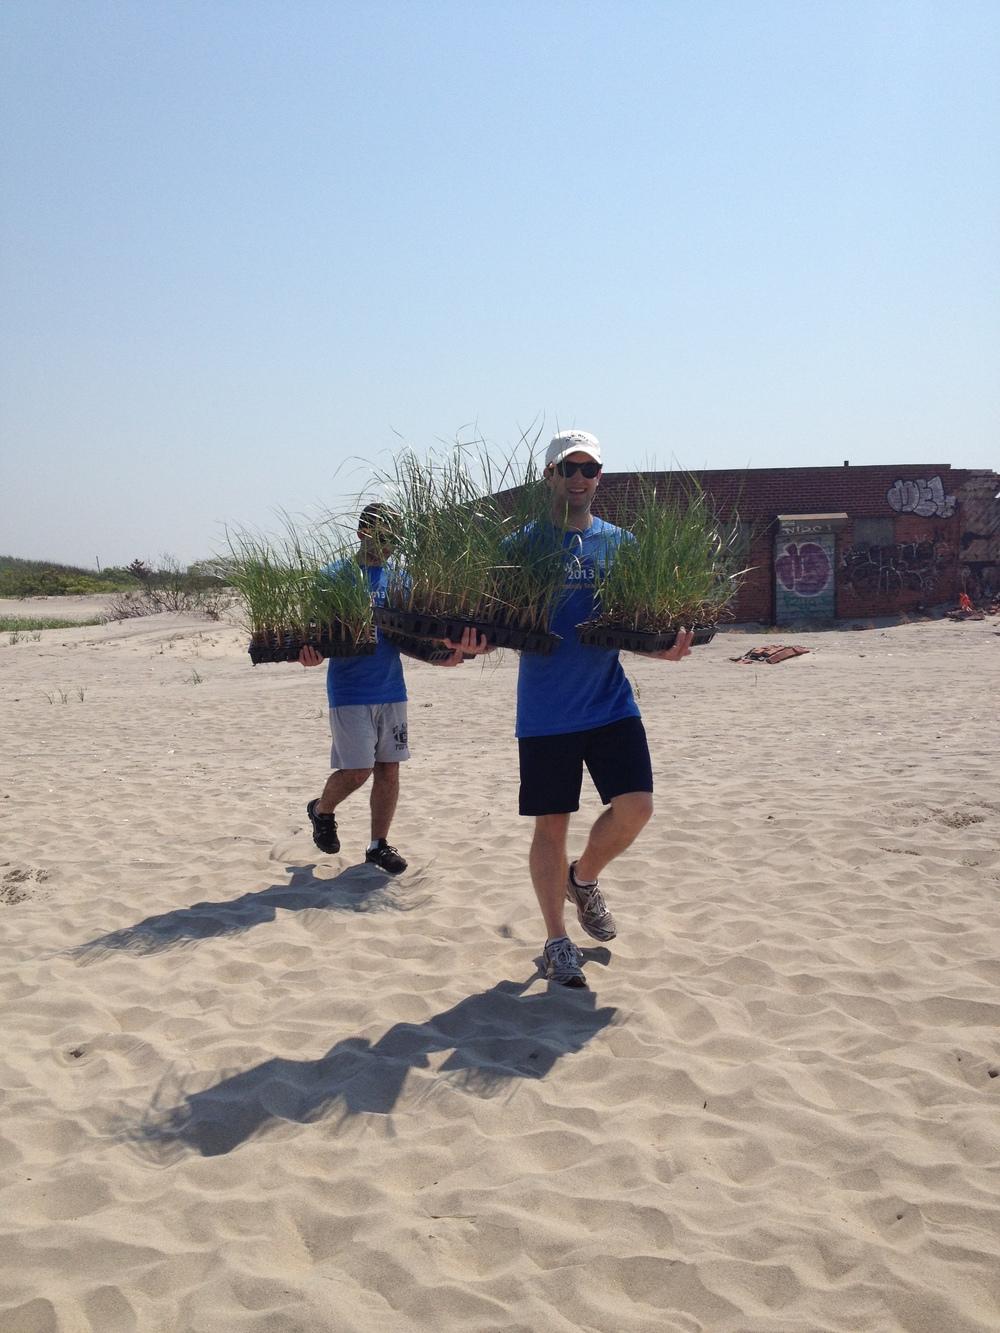 Volontariat à Rockaway Beach après l'ouragan Sandy